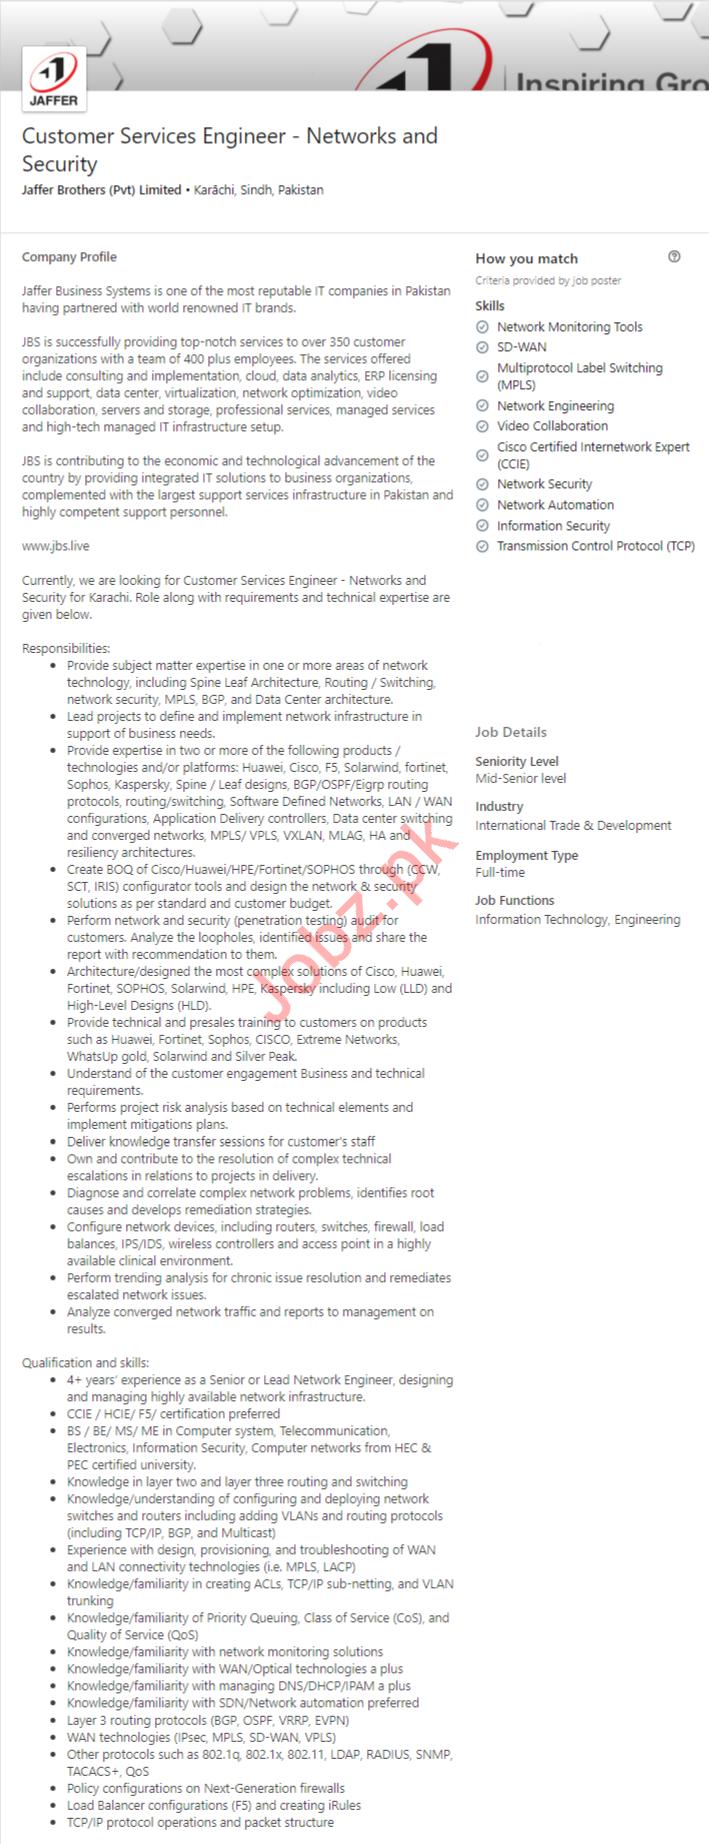 Customer Services Engineer Job 2020 in Karachi